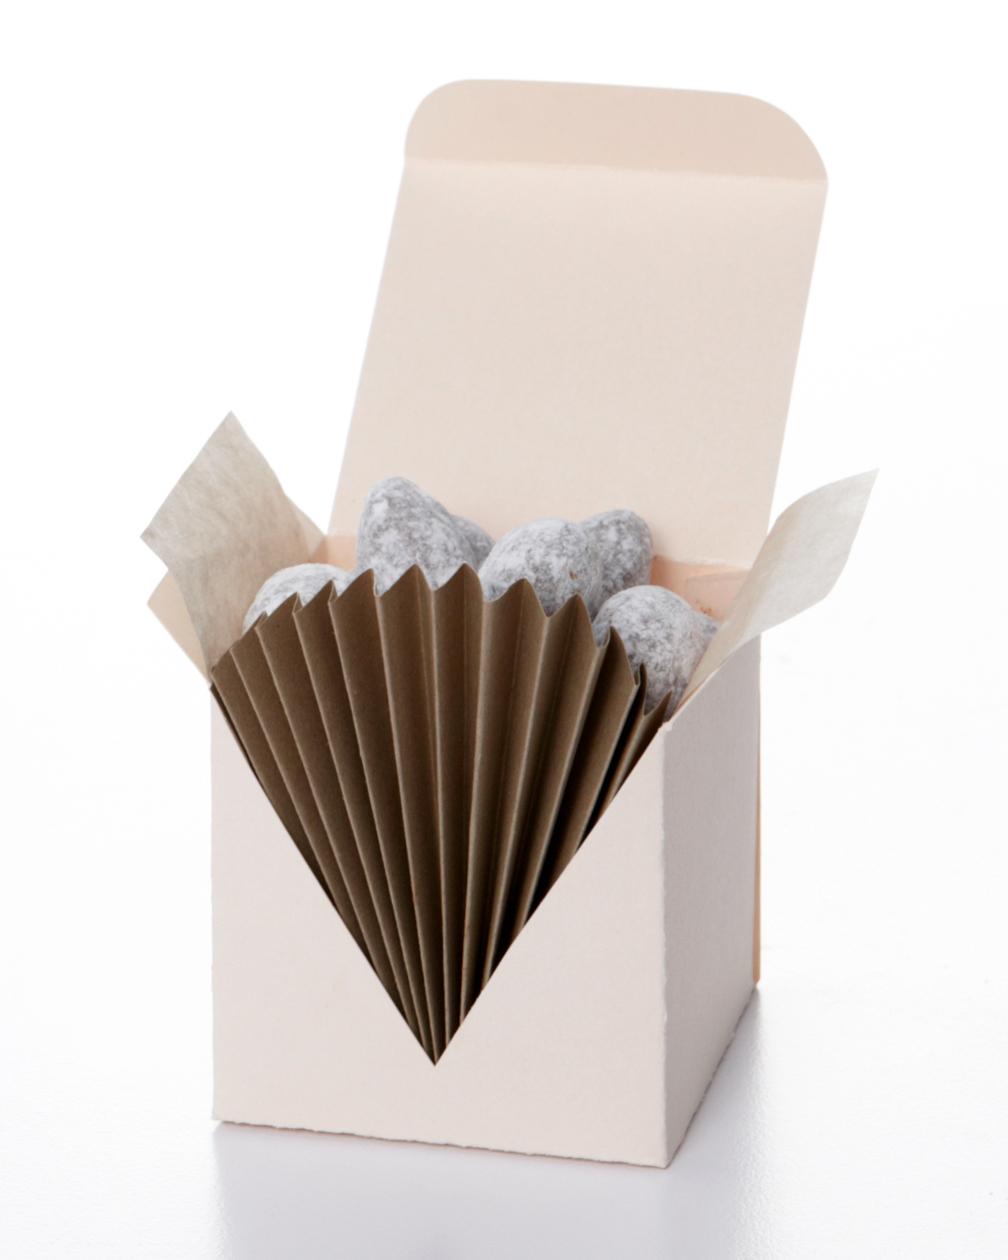 folded-favors-031-wd110073.jpg